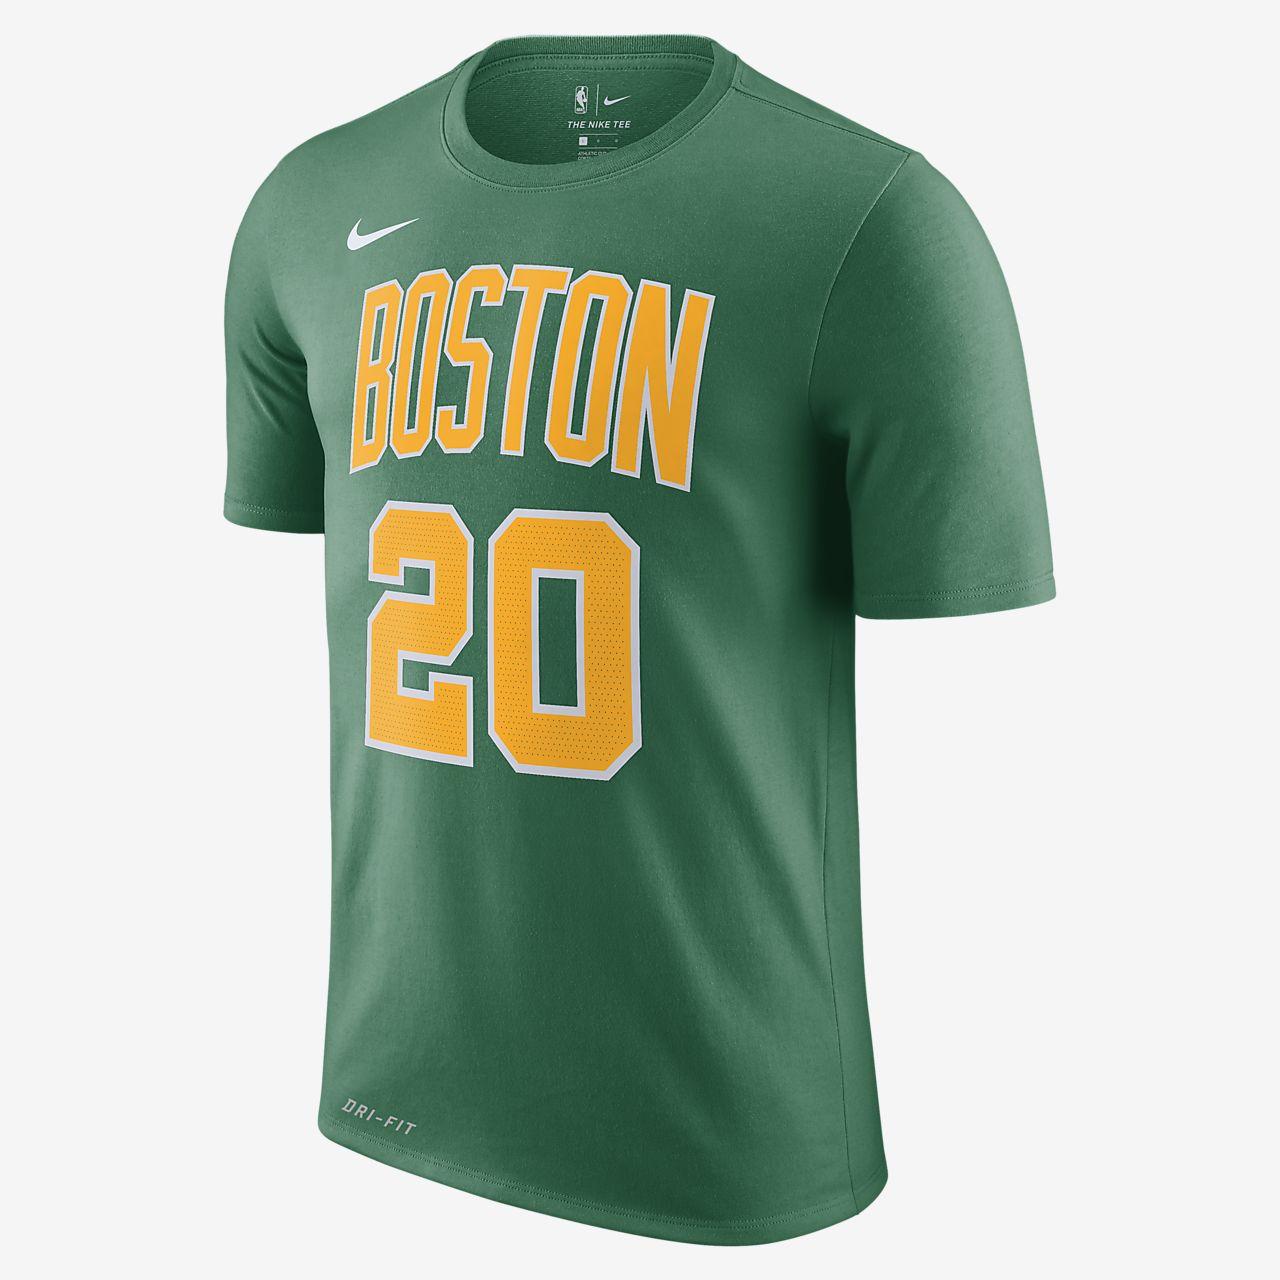 buy online b3859 f125d Gordon Hayward Boston Celtics City Edition Nike Dri-FIT Men's NBA T-Shirt